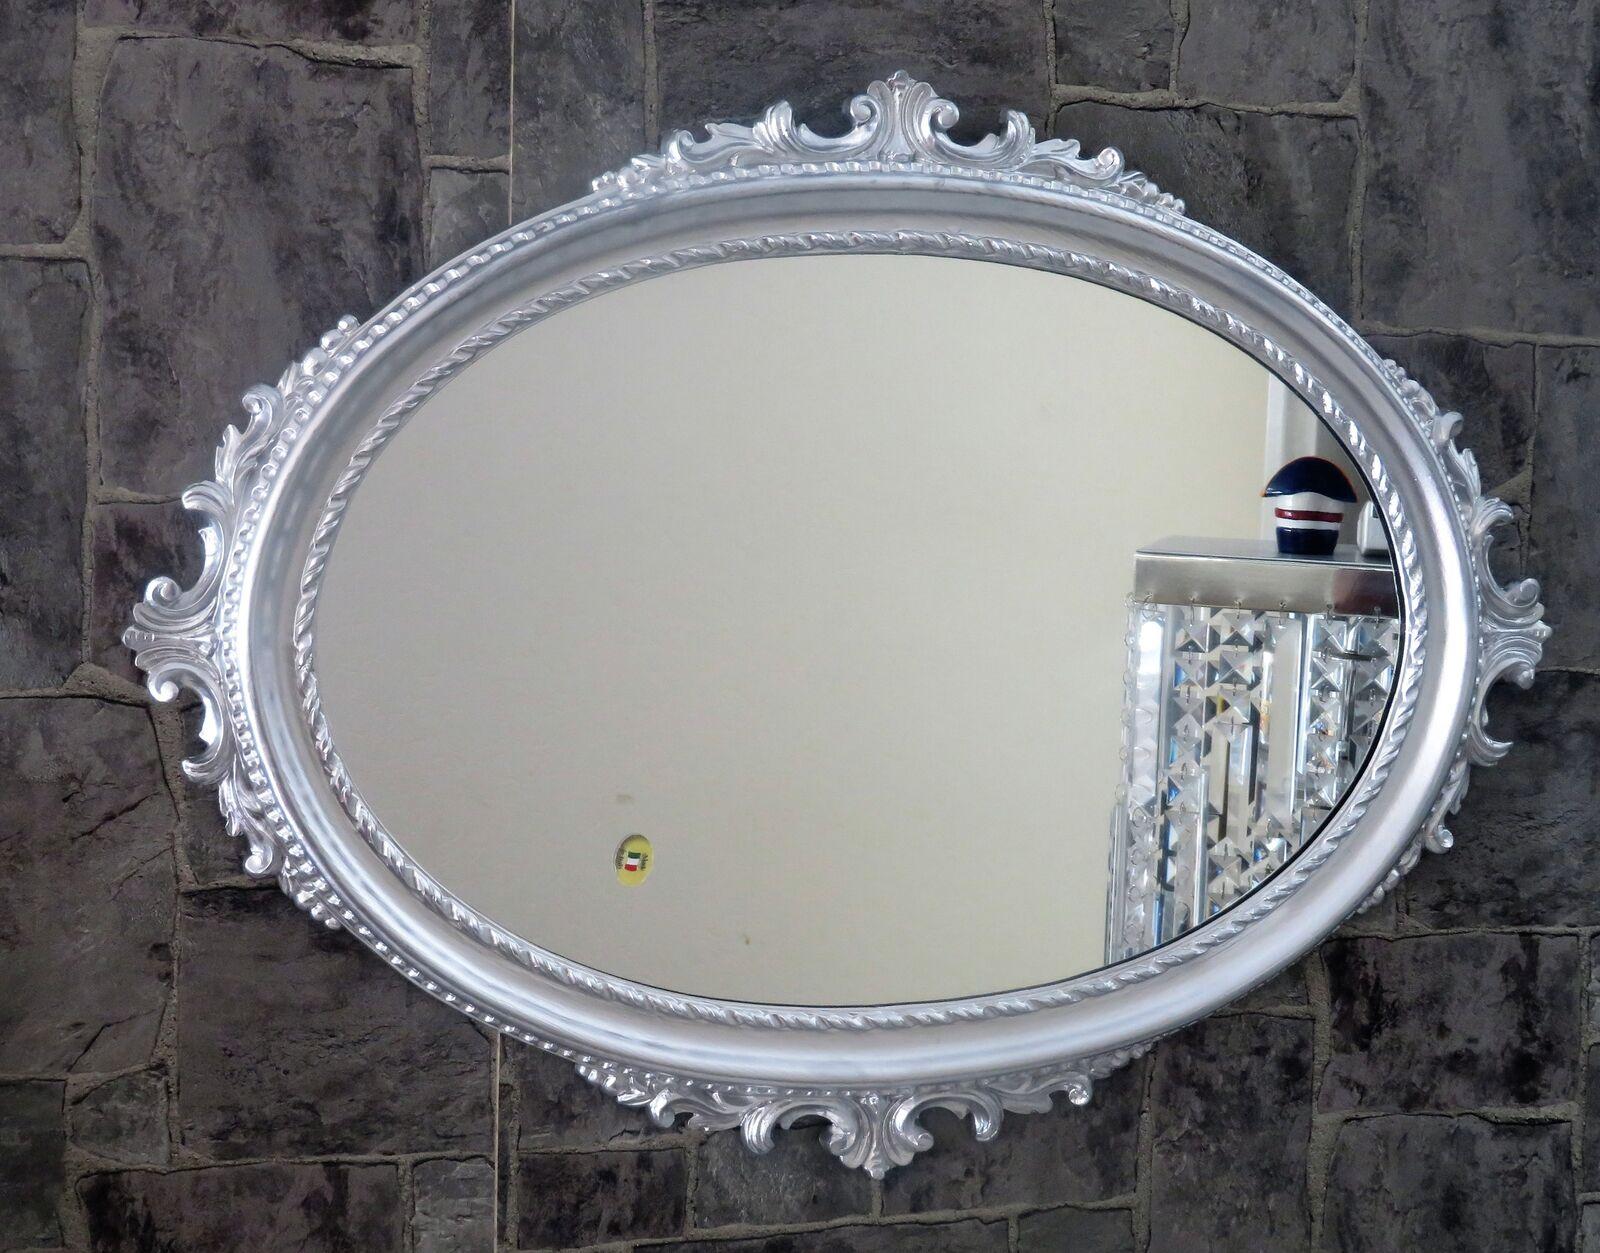 Wandspiegel Silber Oval Barock Badspiegel Spiegel Antik 62x48cm